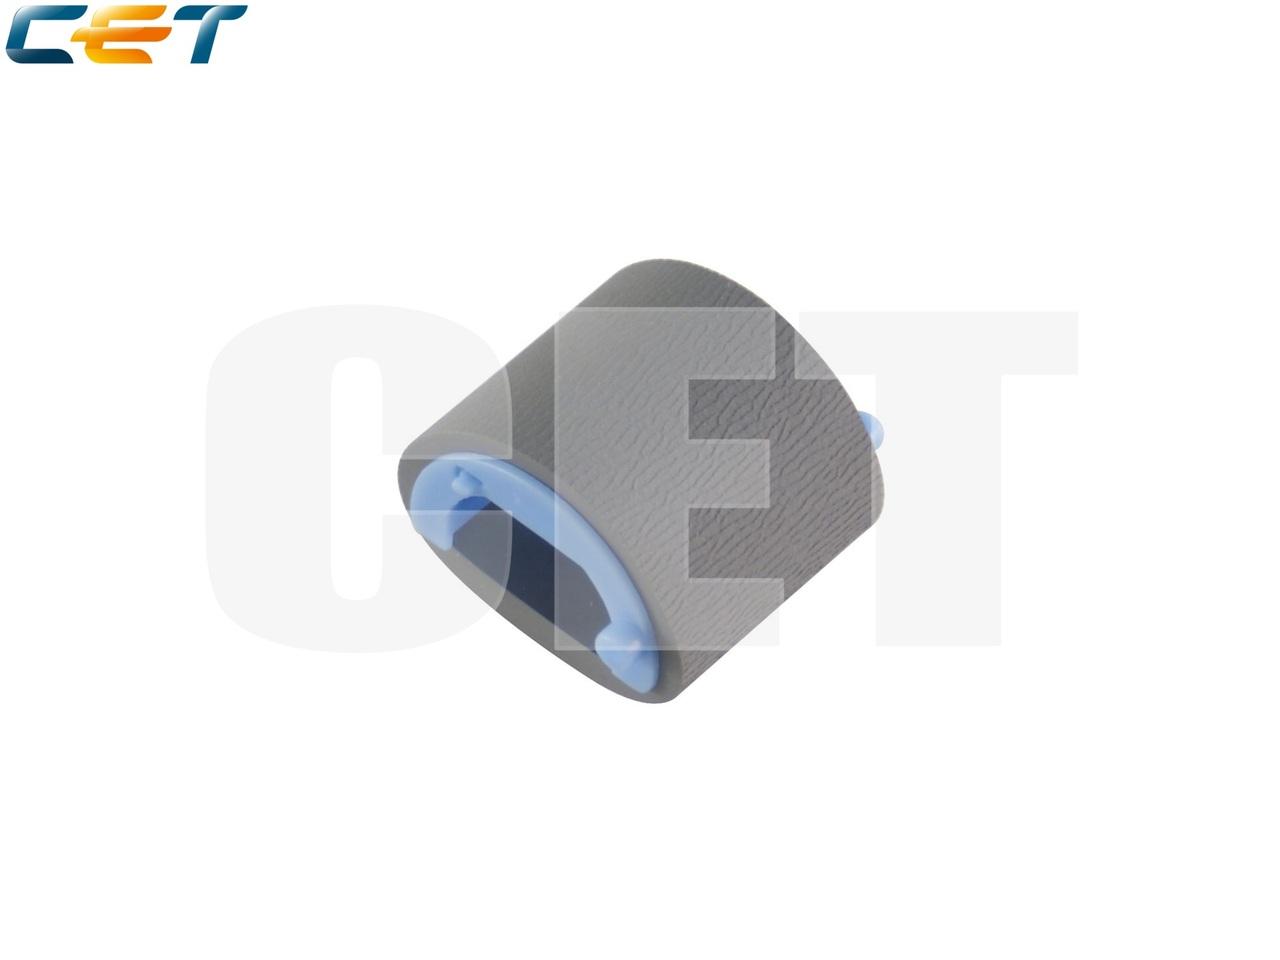 Ролик подхвата RL1-1442-000 для HP LaserJet P1006/P1102,M125/M126, Pro M104/M132 (CET), CET4702, CET4702R